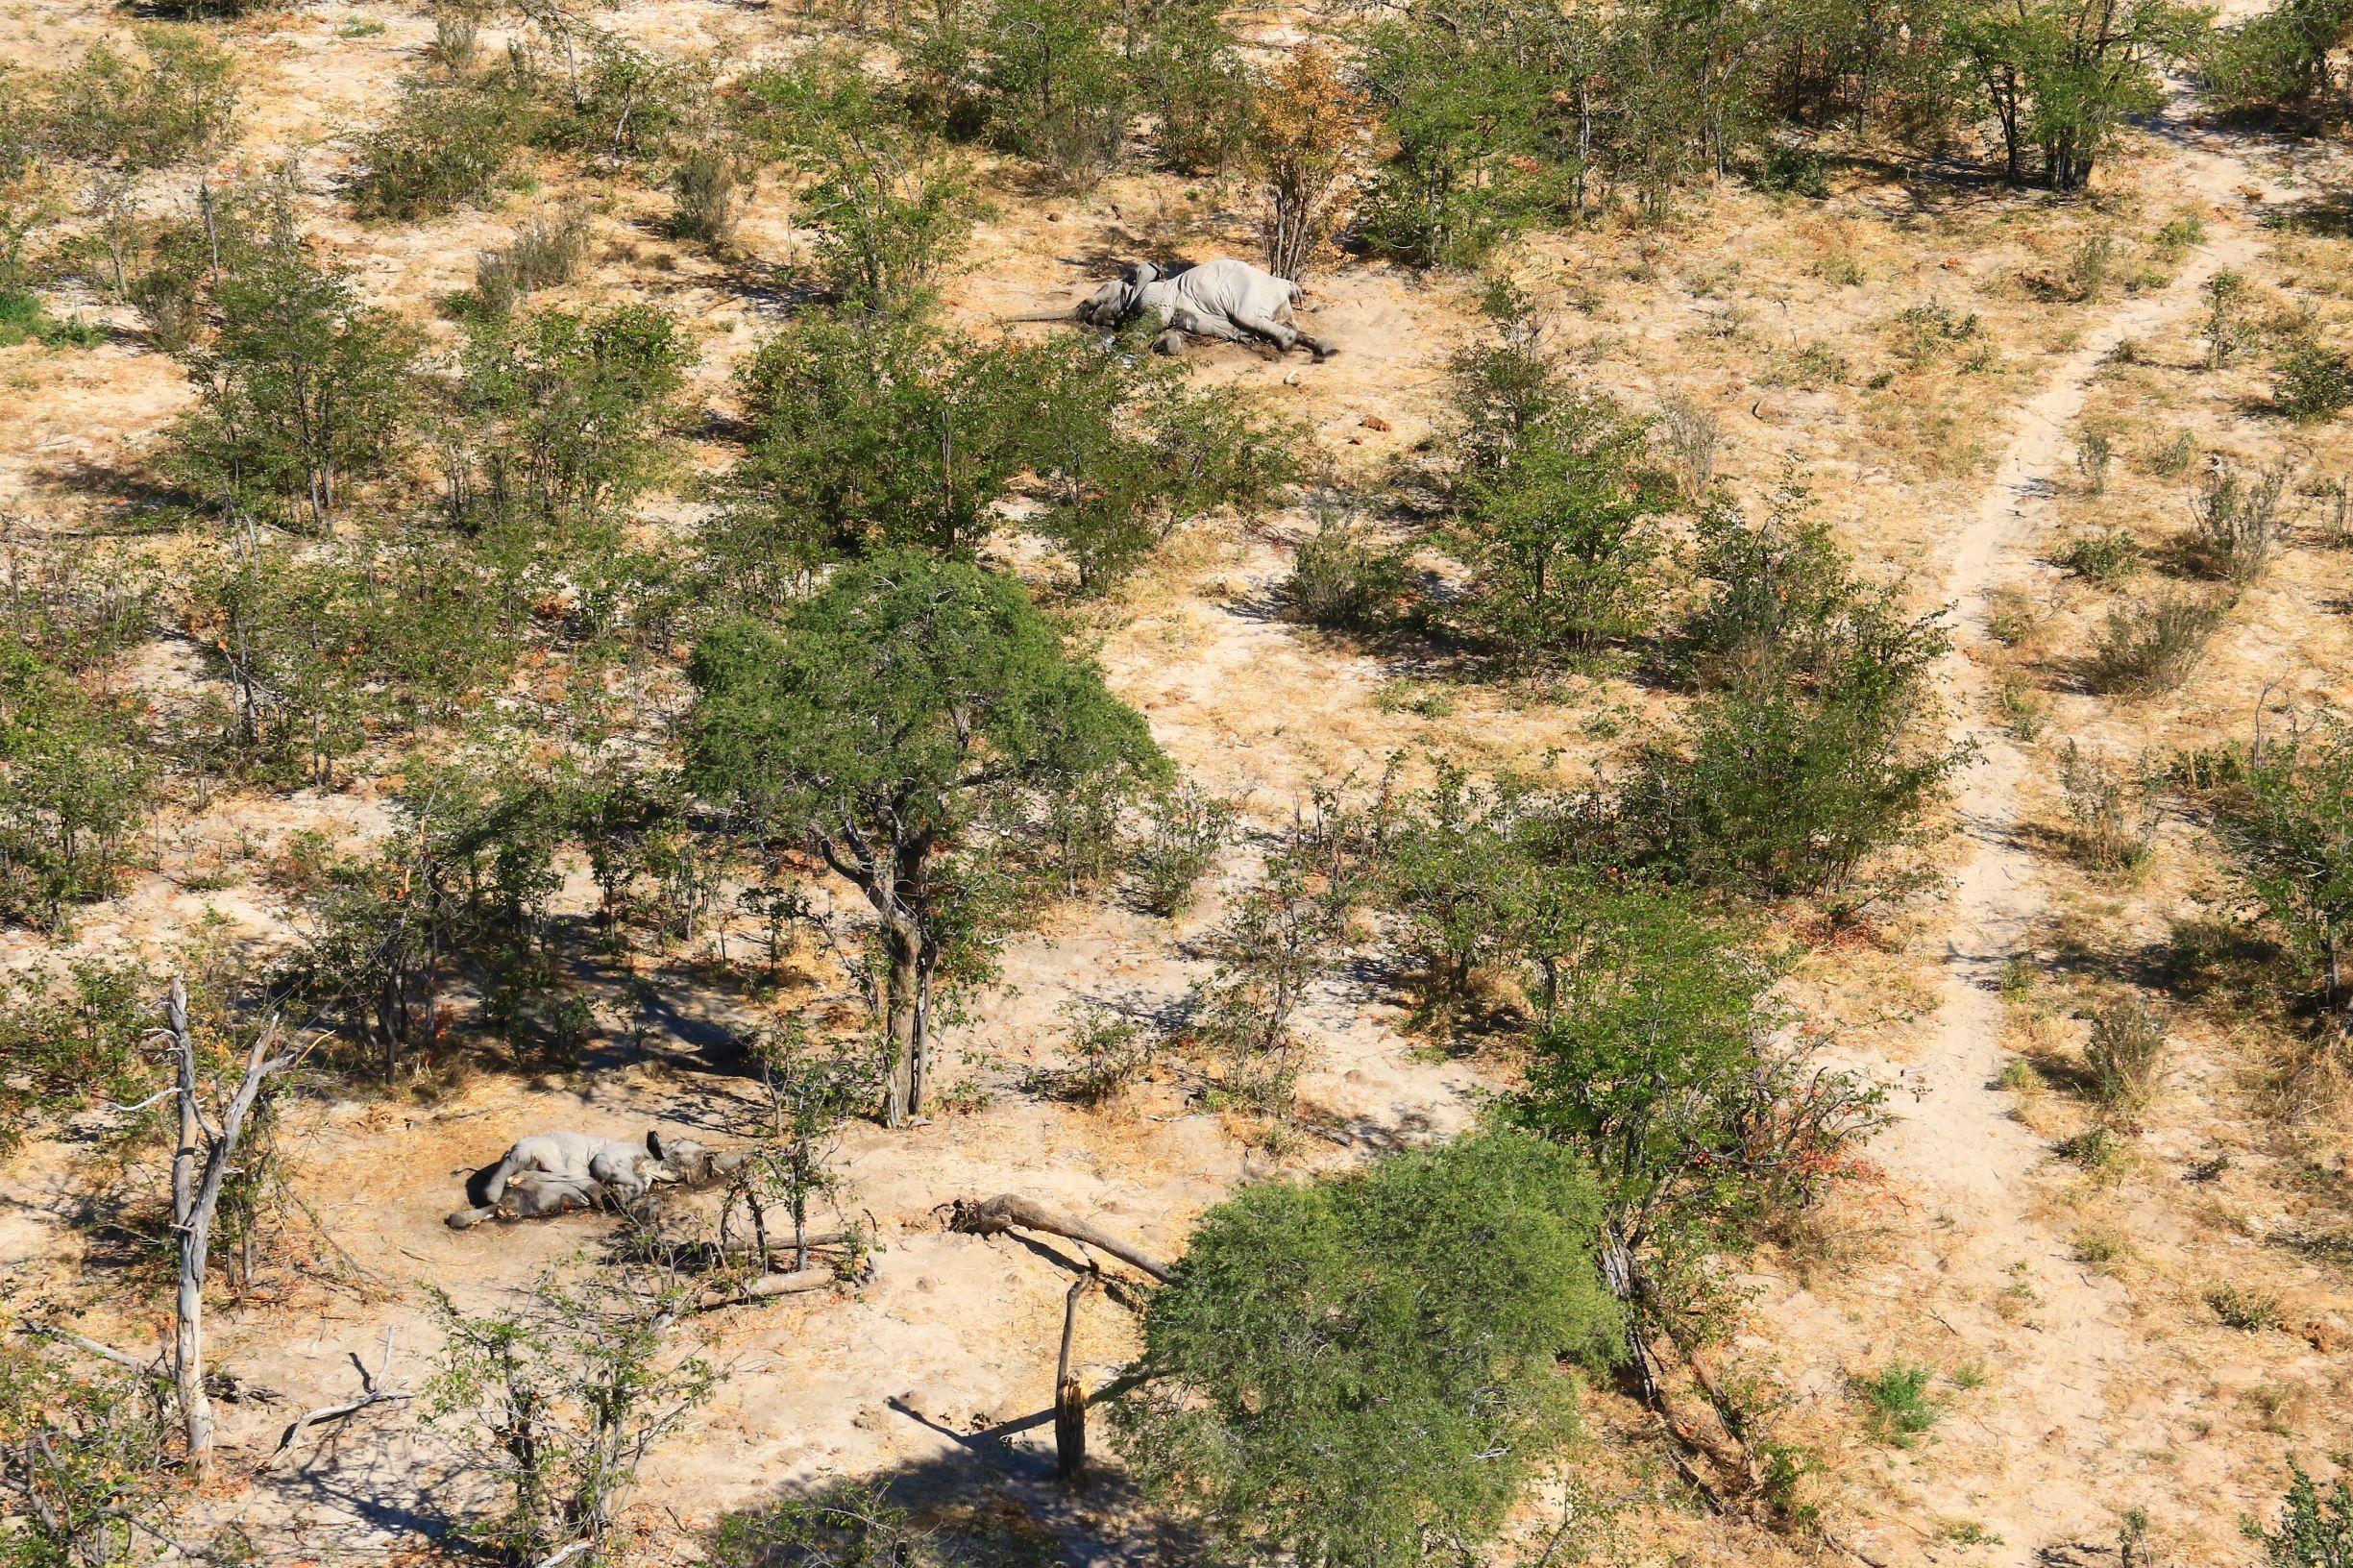 Over 400 Botswana elephants killed in mystery mass die-off - Daily Maverick